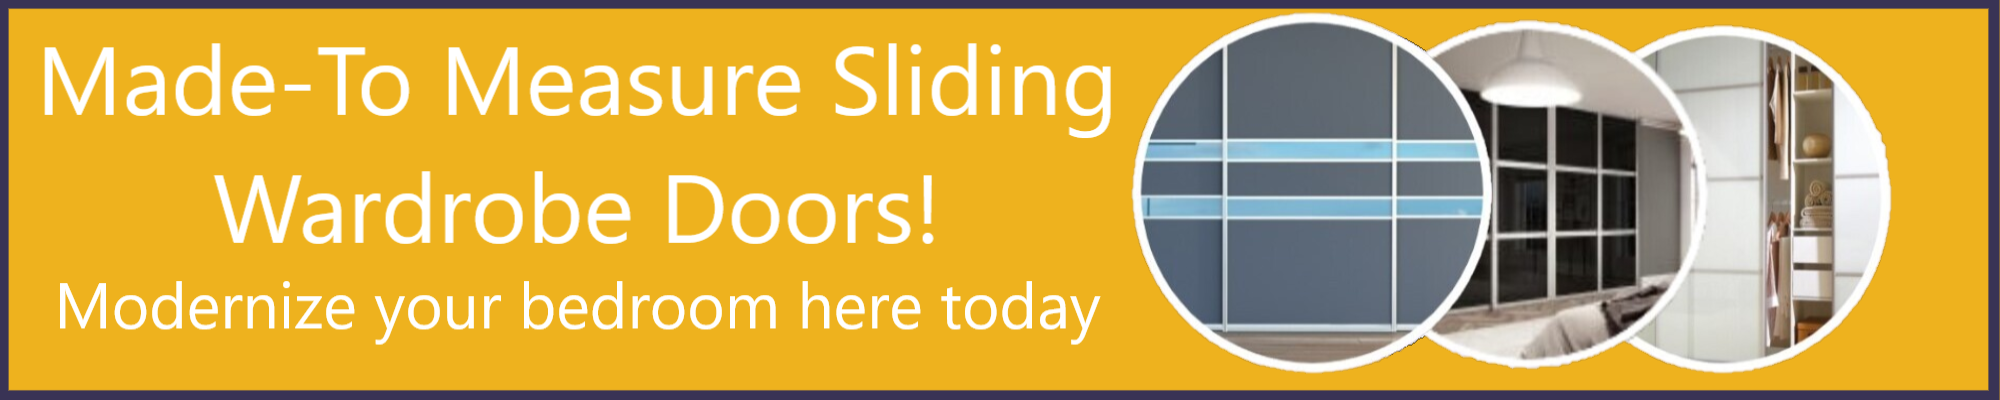 Sliding Wardrobe Doors, Home Improvements